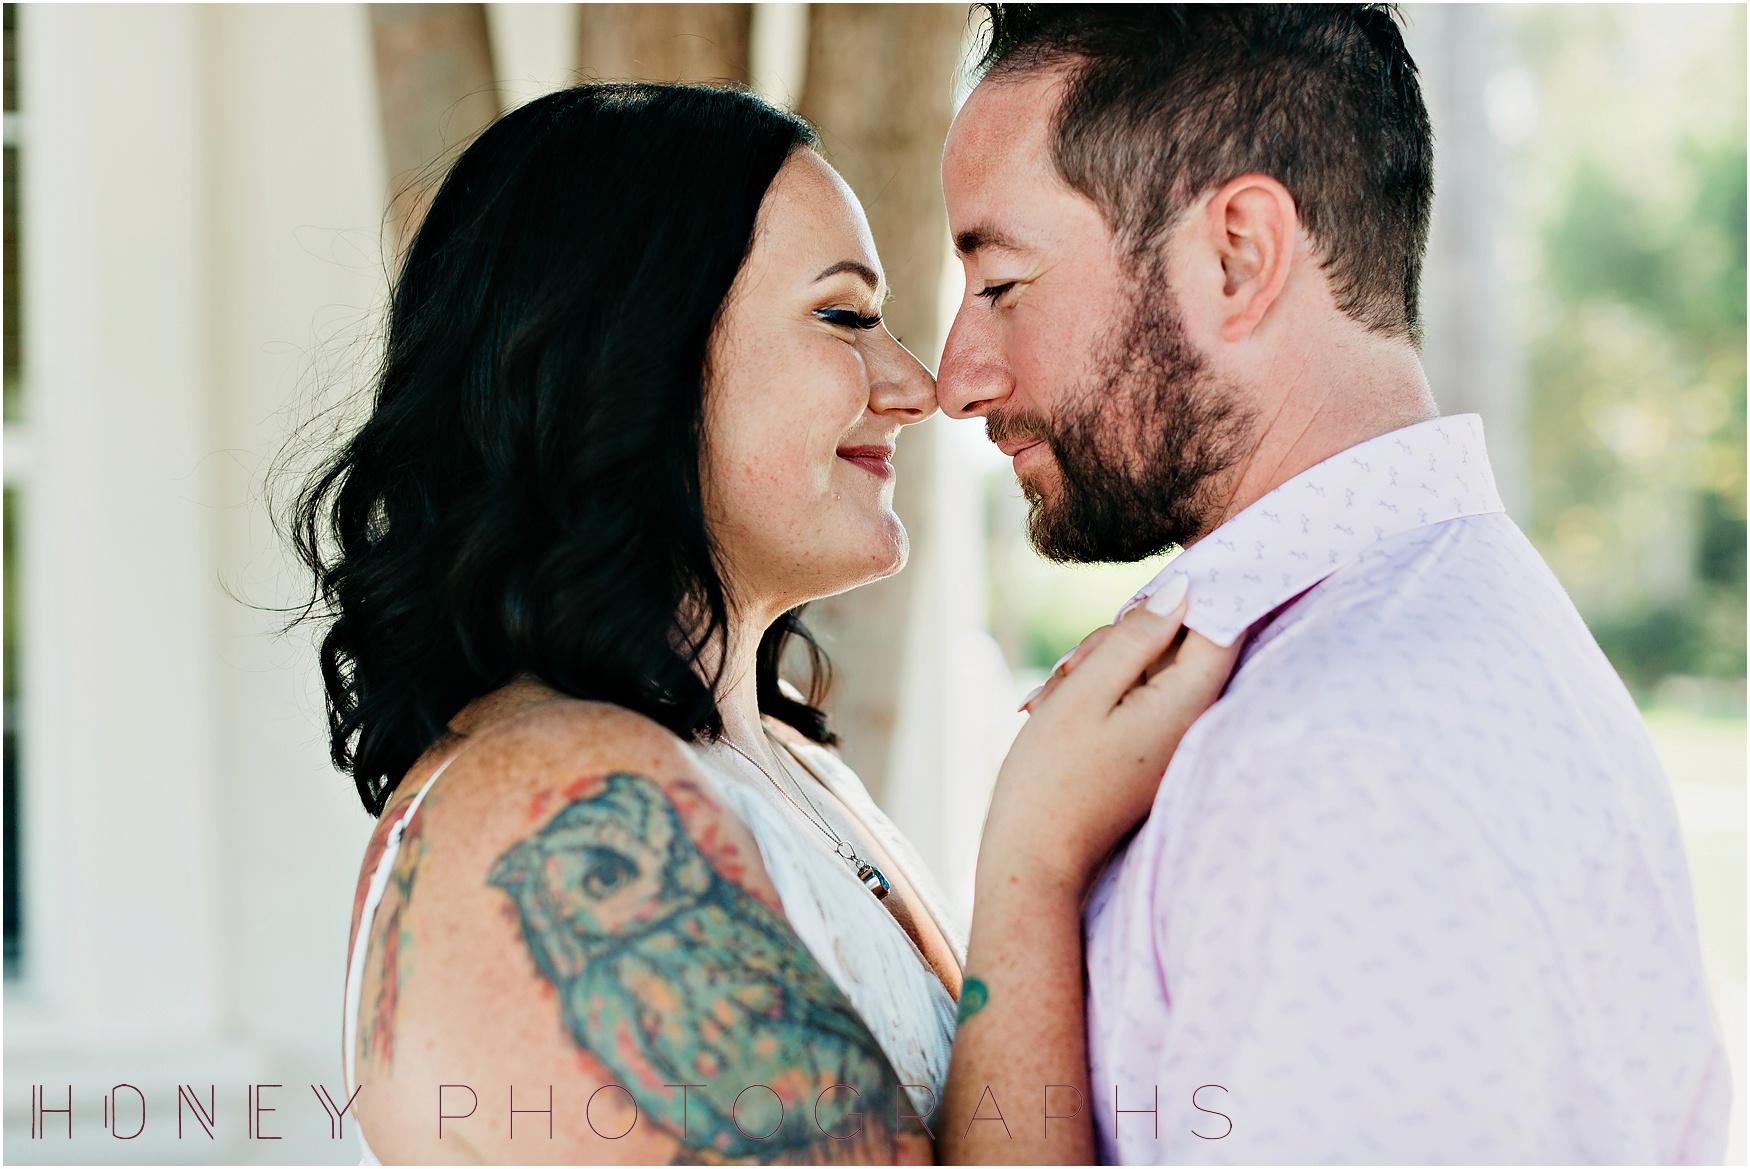 colorful_ecclectic_vibrant_vista_rainbow_quirky_wedding057.jpg